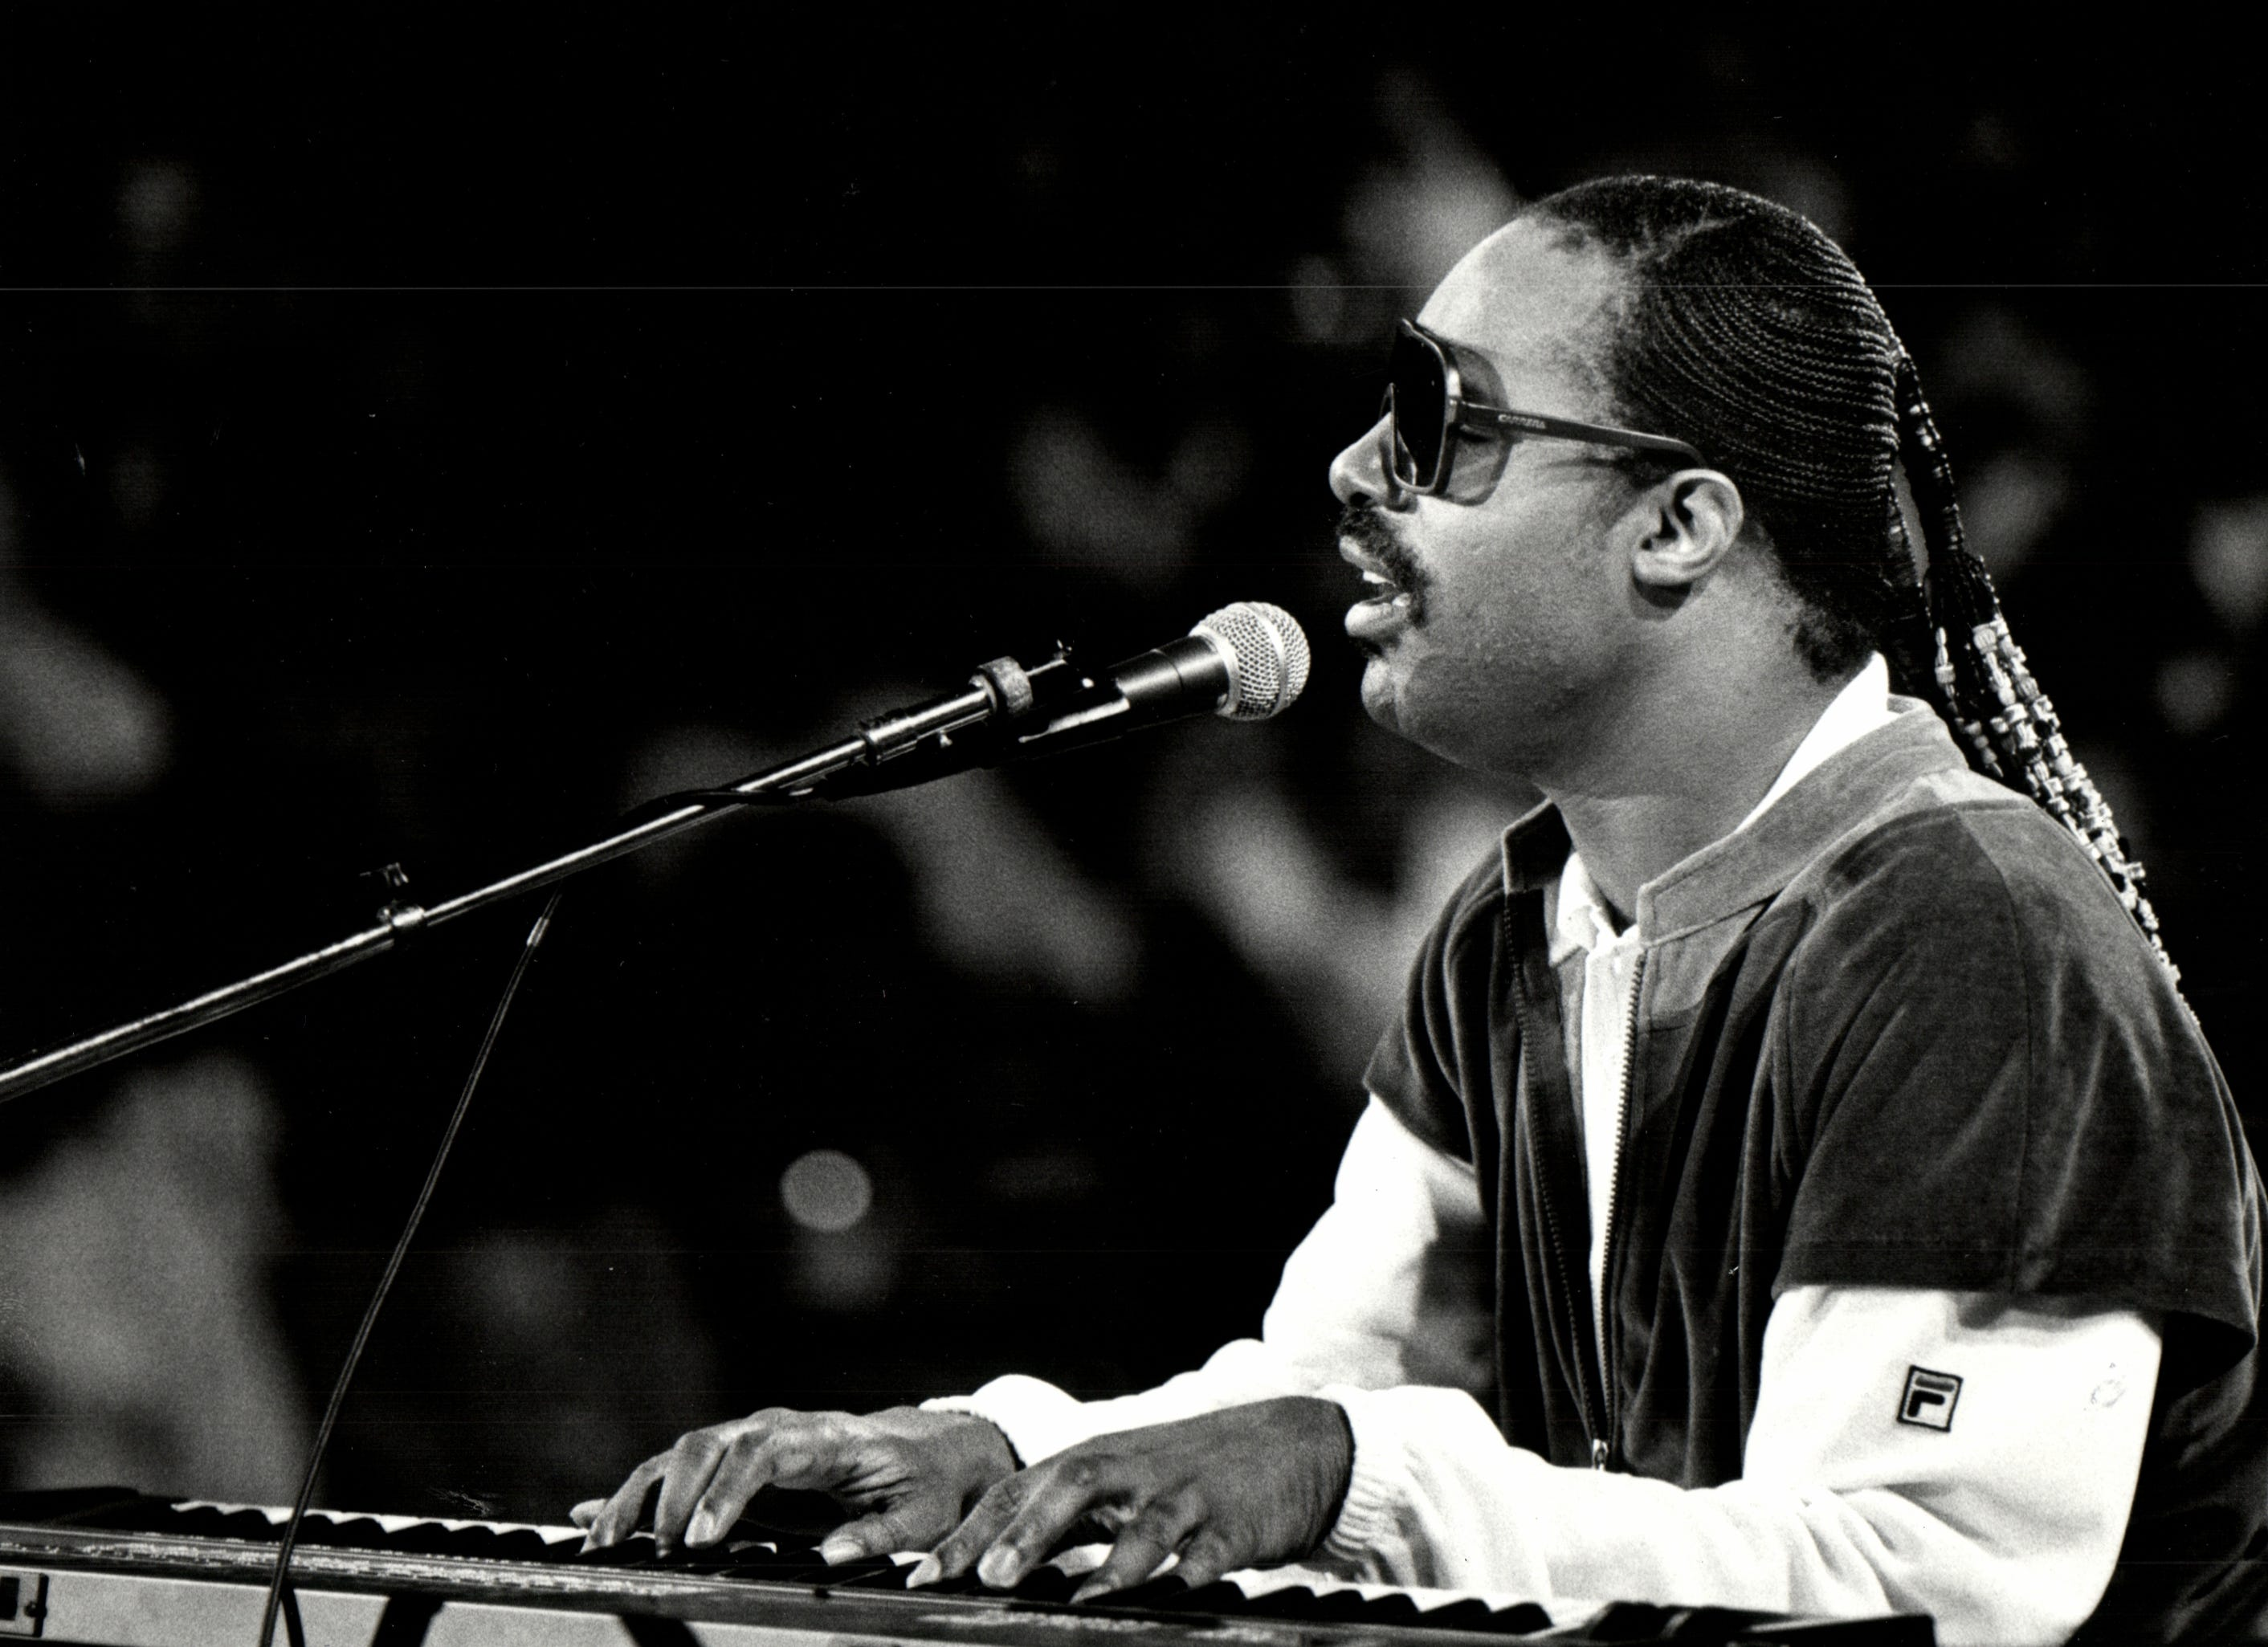 Stevie Wonder performs in Detroit on April 13, 1984.